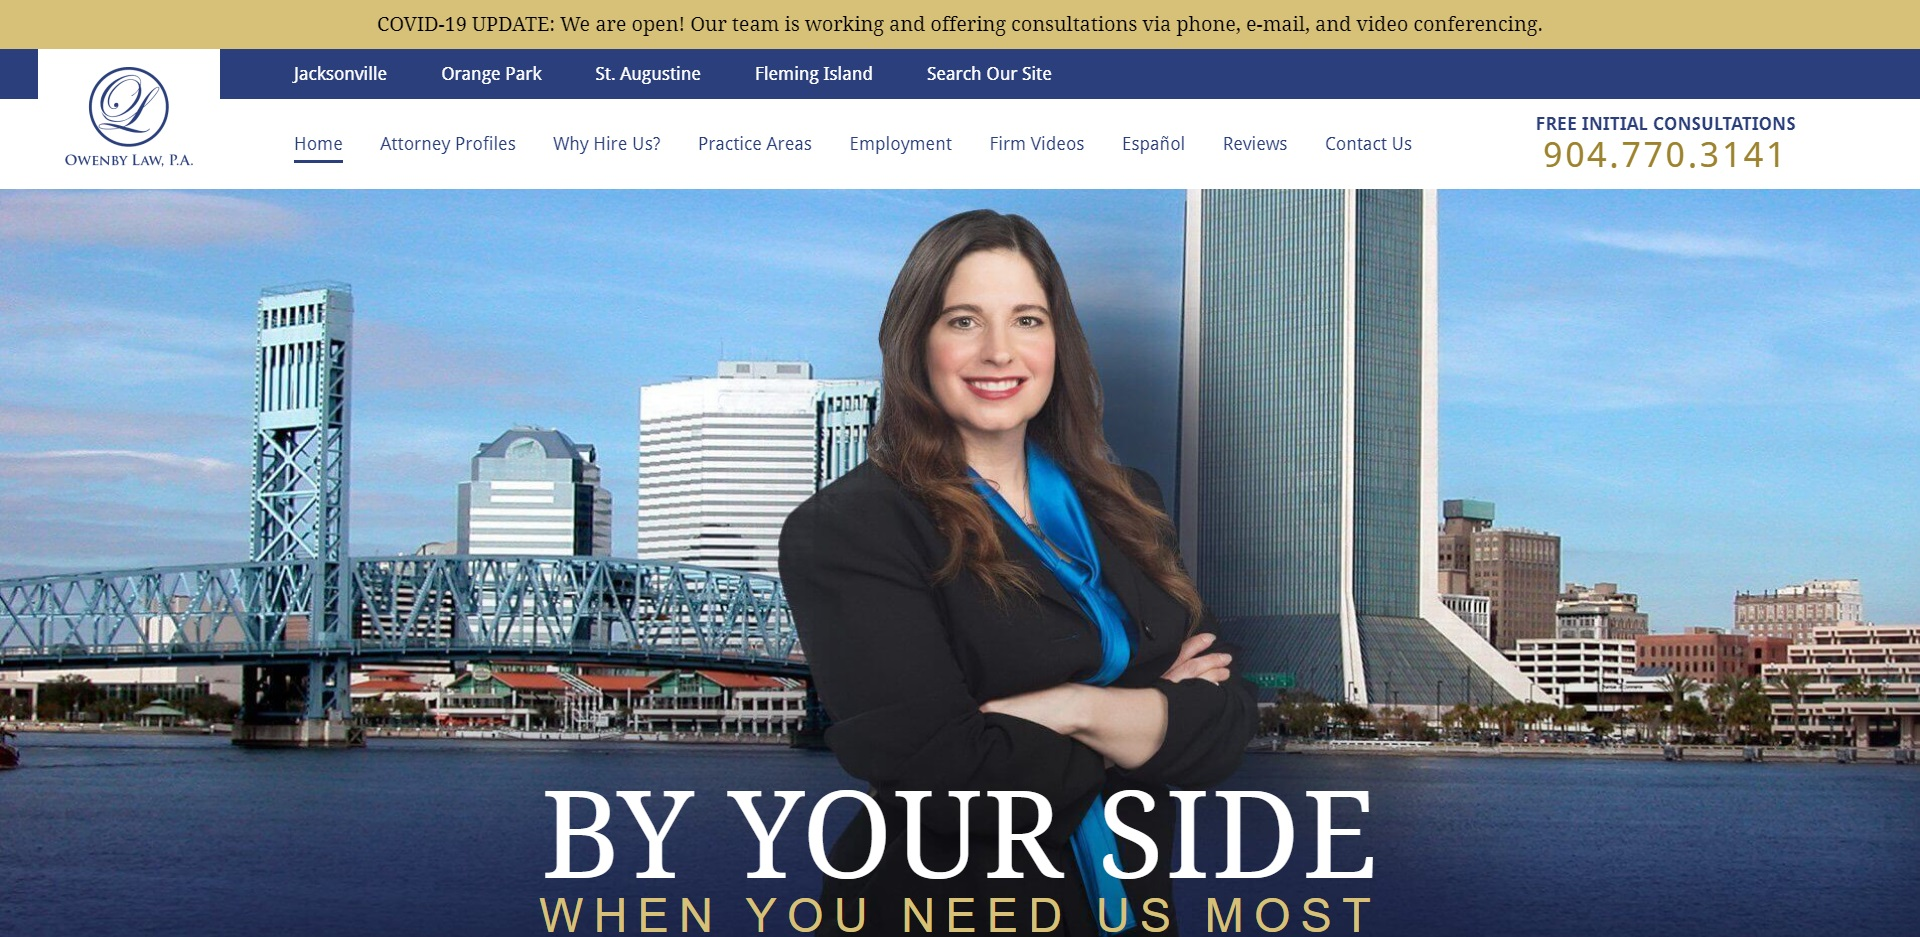 The Best Child Custody Attorneys in Jacksonville